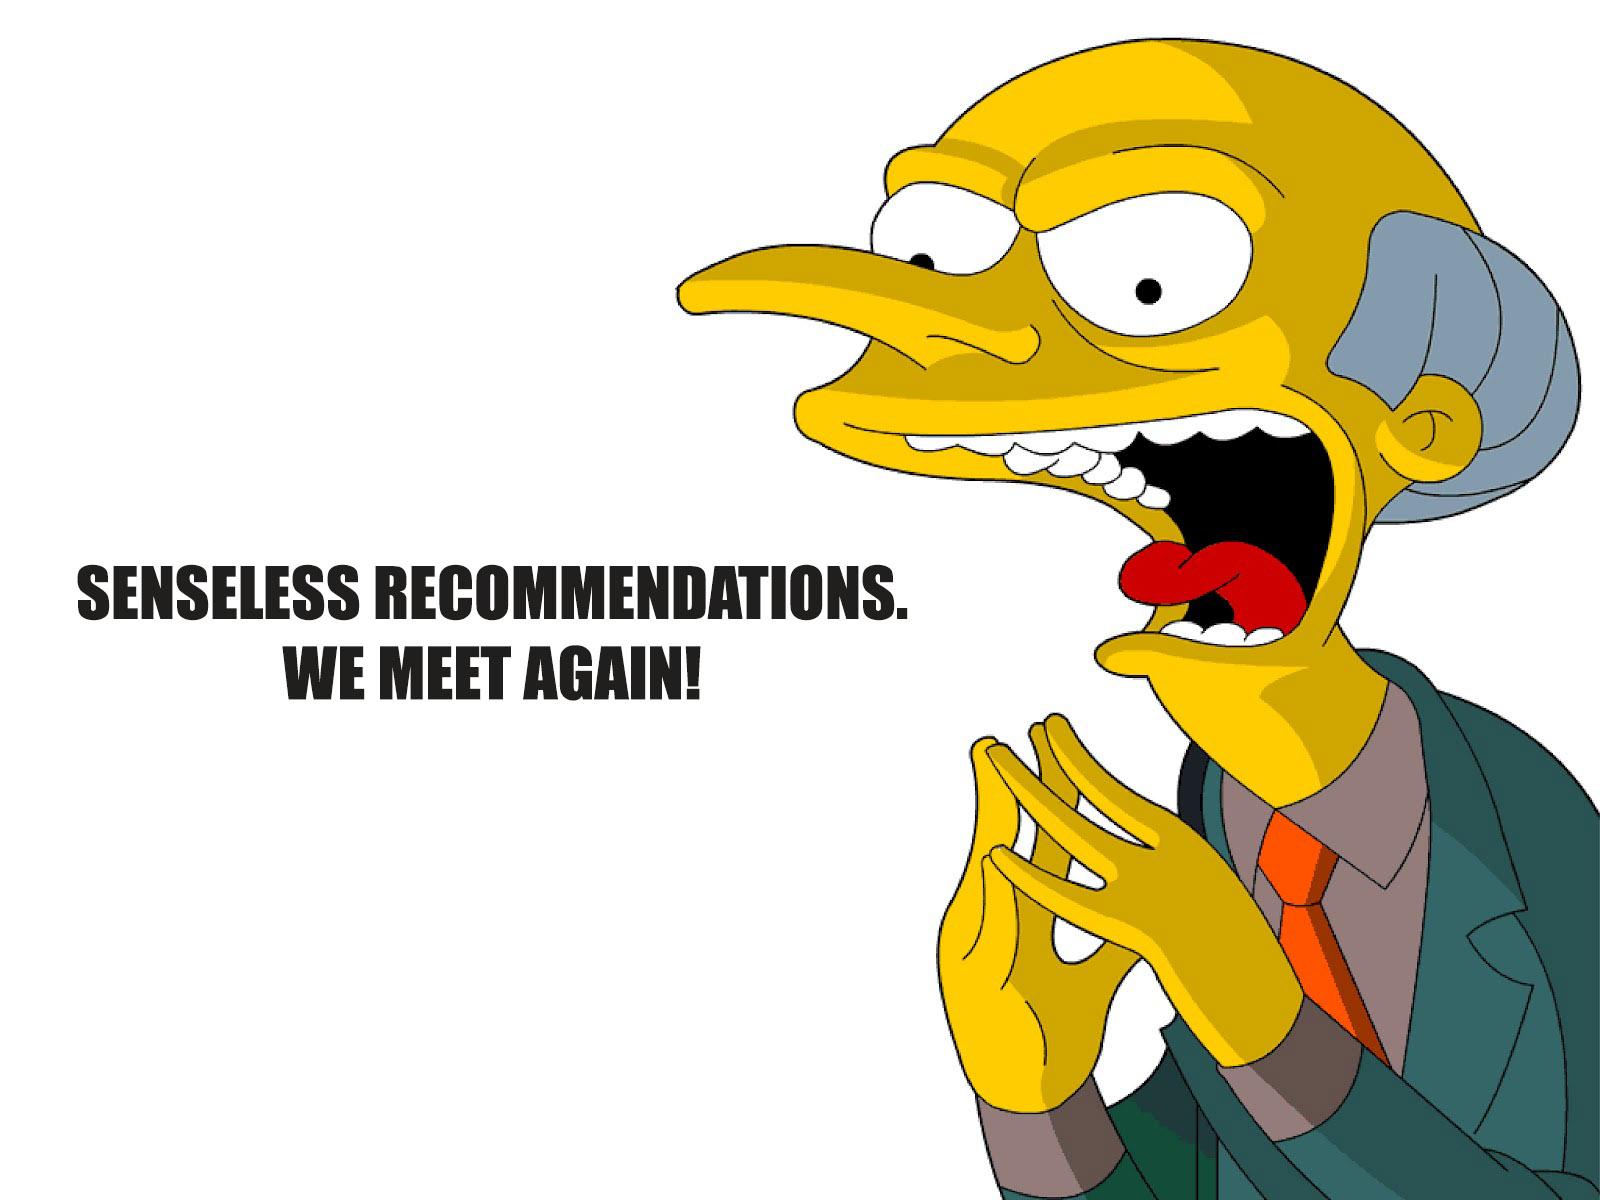 LINKEDIN SENSELESS RECOMMENDATIONS